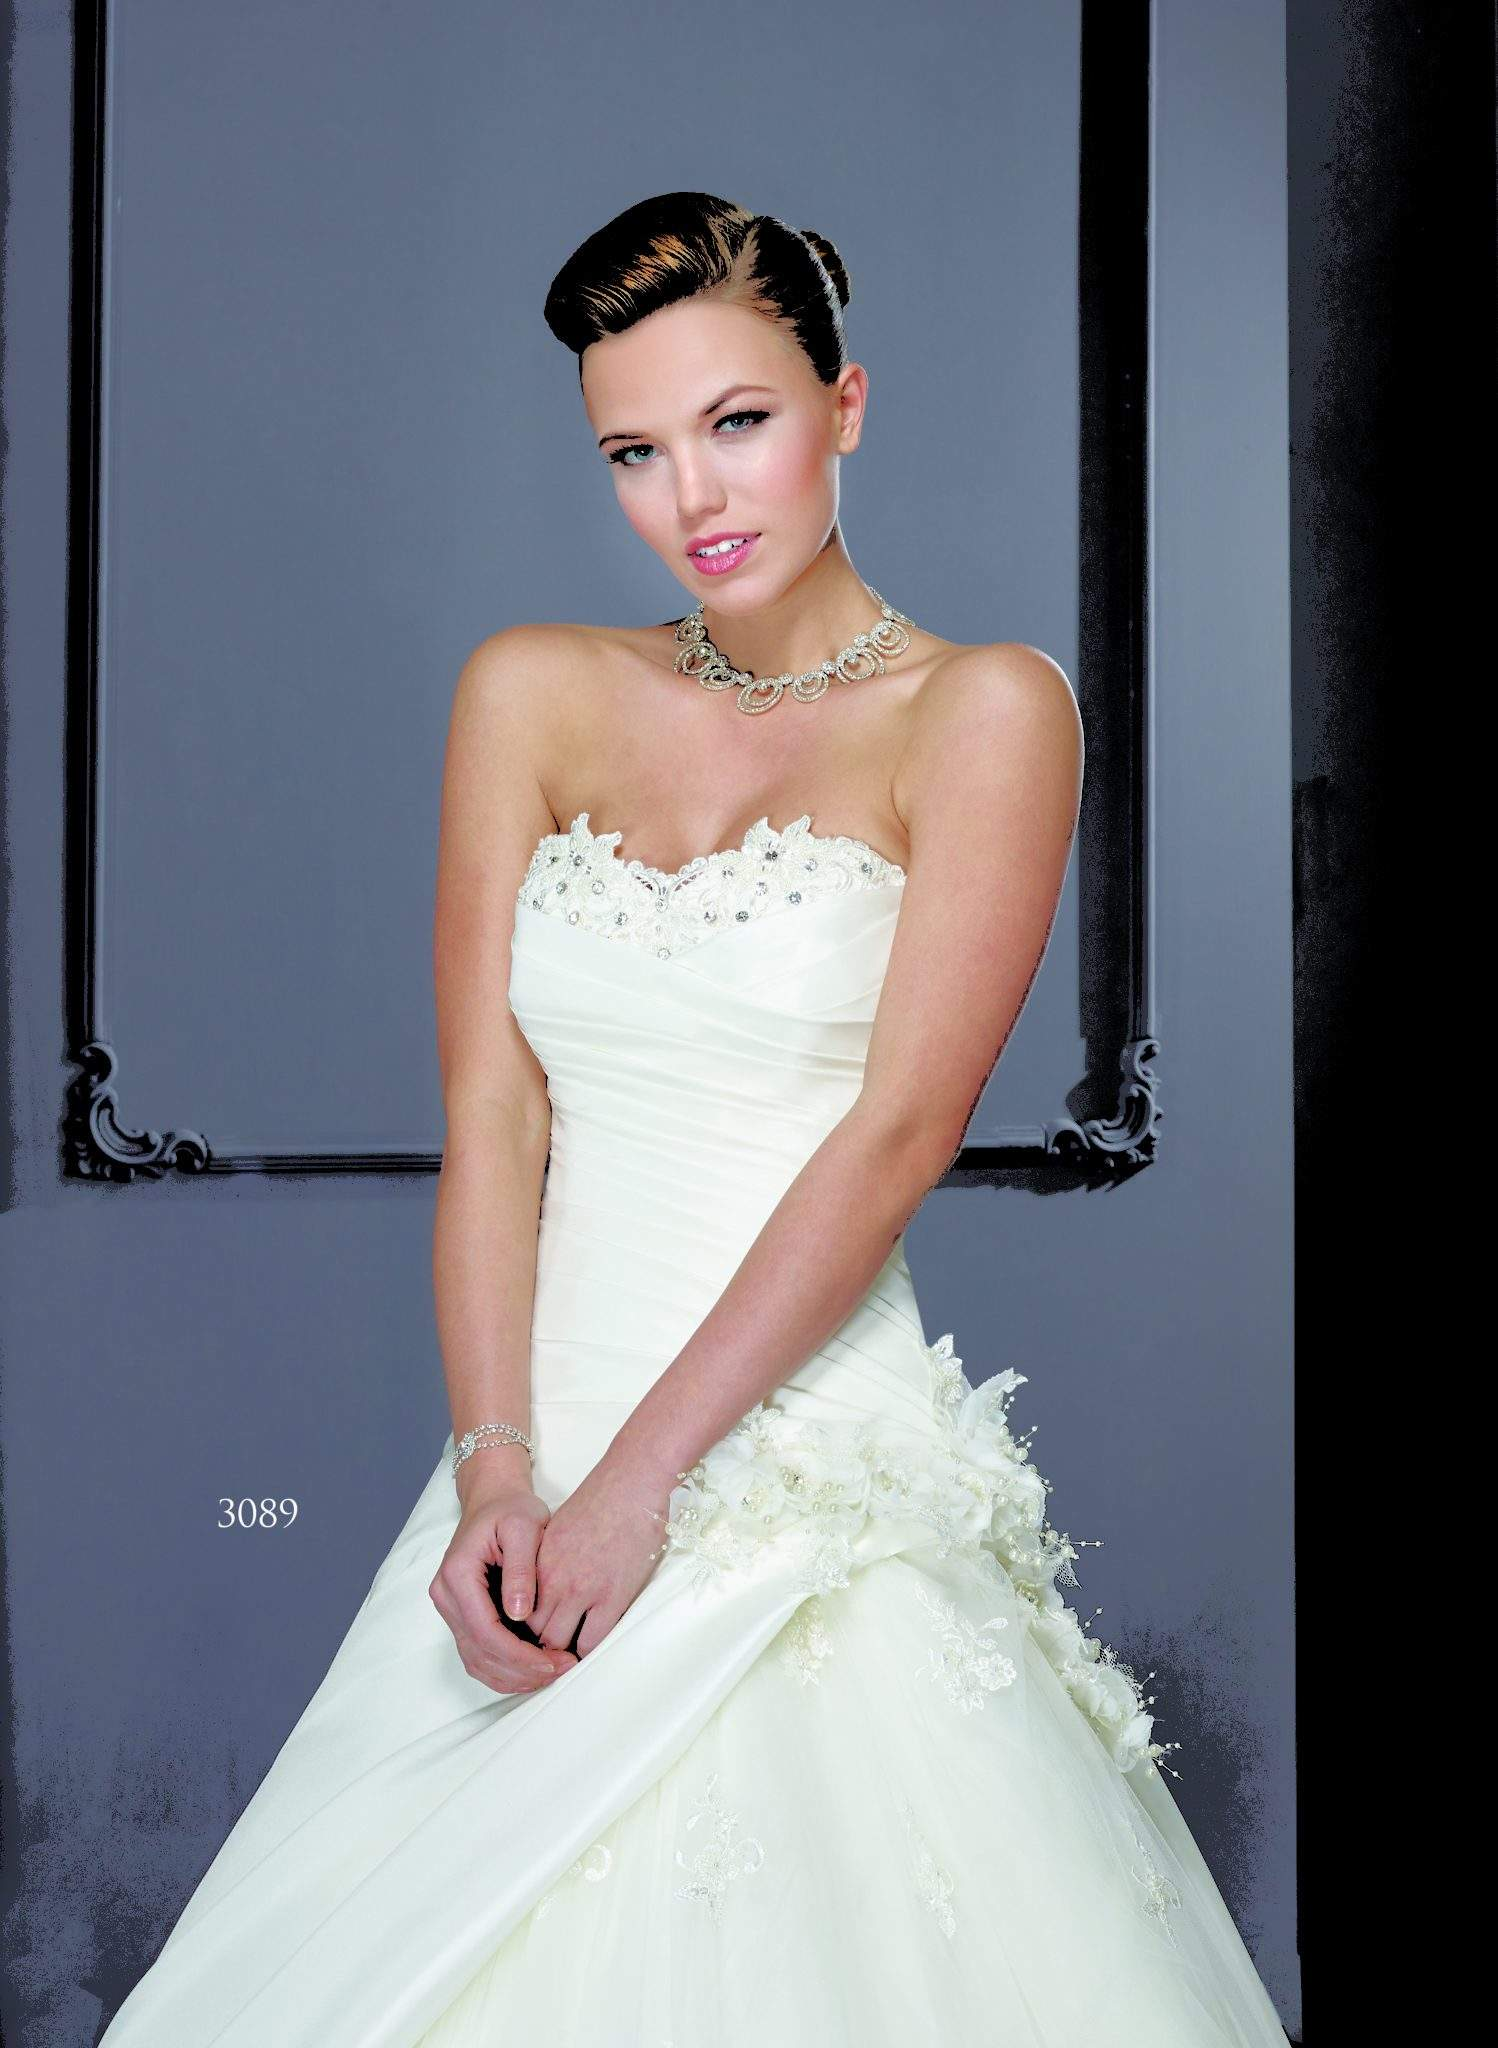 Silk flower wedding gowns darius cordell fashion ltd strapless flower wedding dresses ombrellifo Choice Image